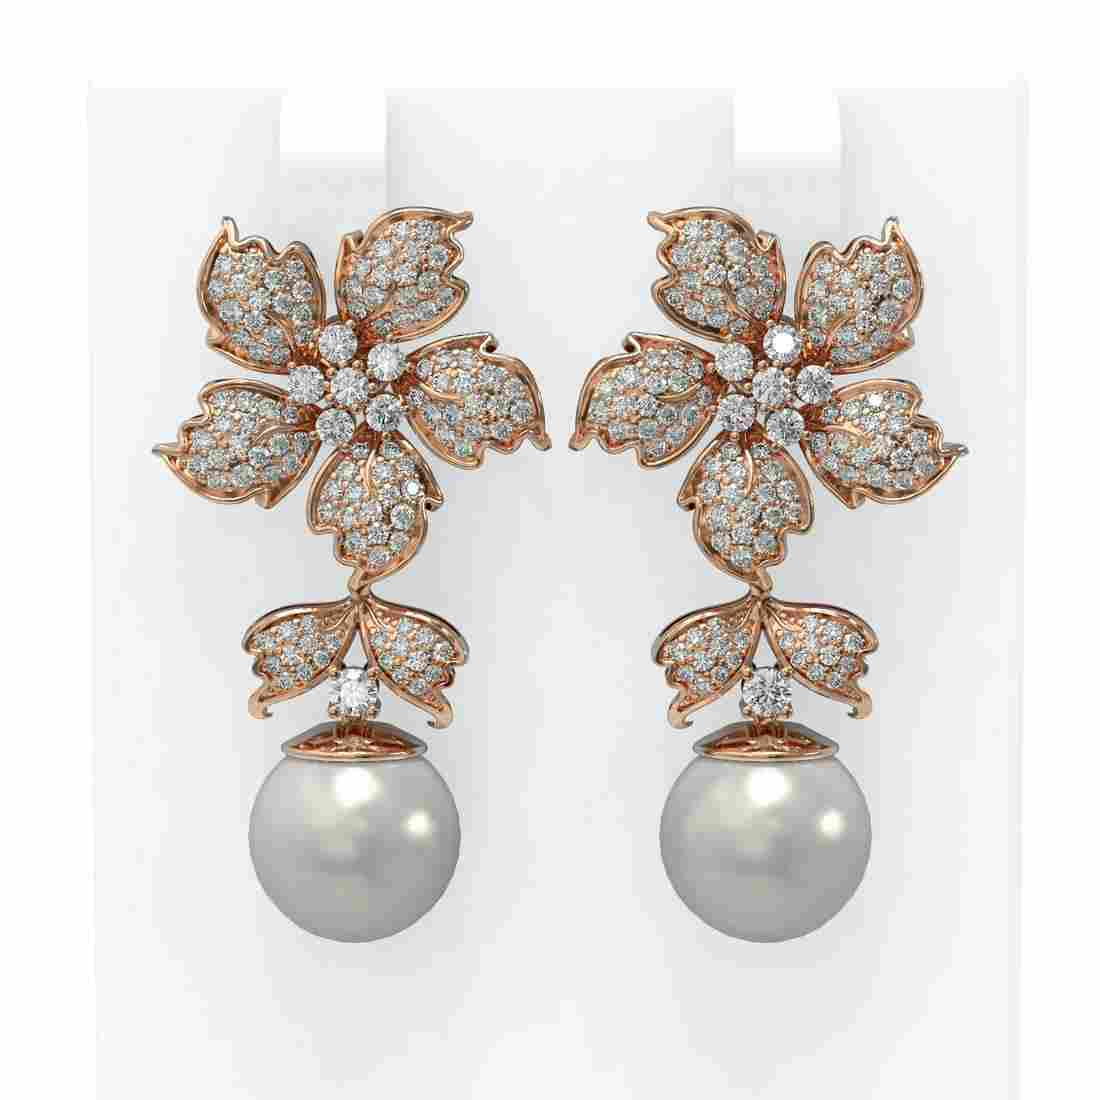 3 ctw Diamond & Pearl Earrings 18K Rose Gold -